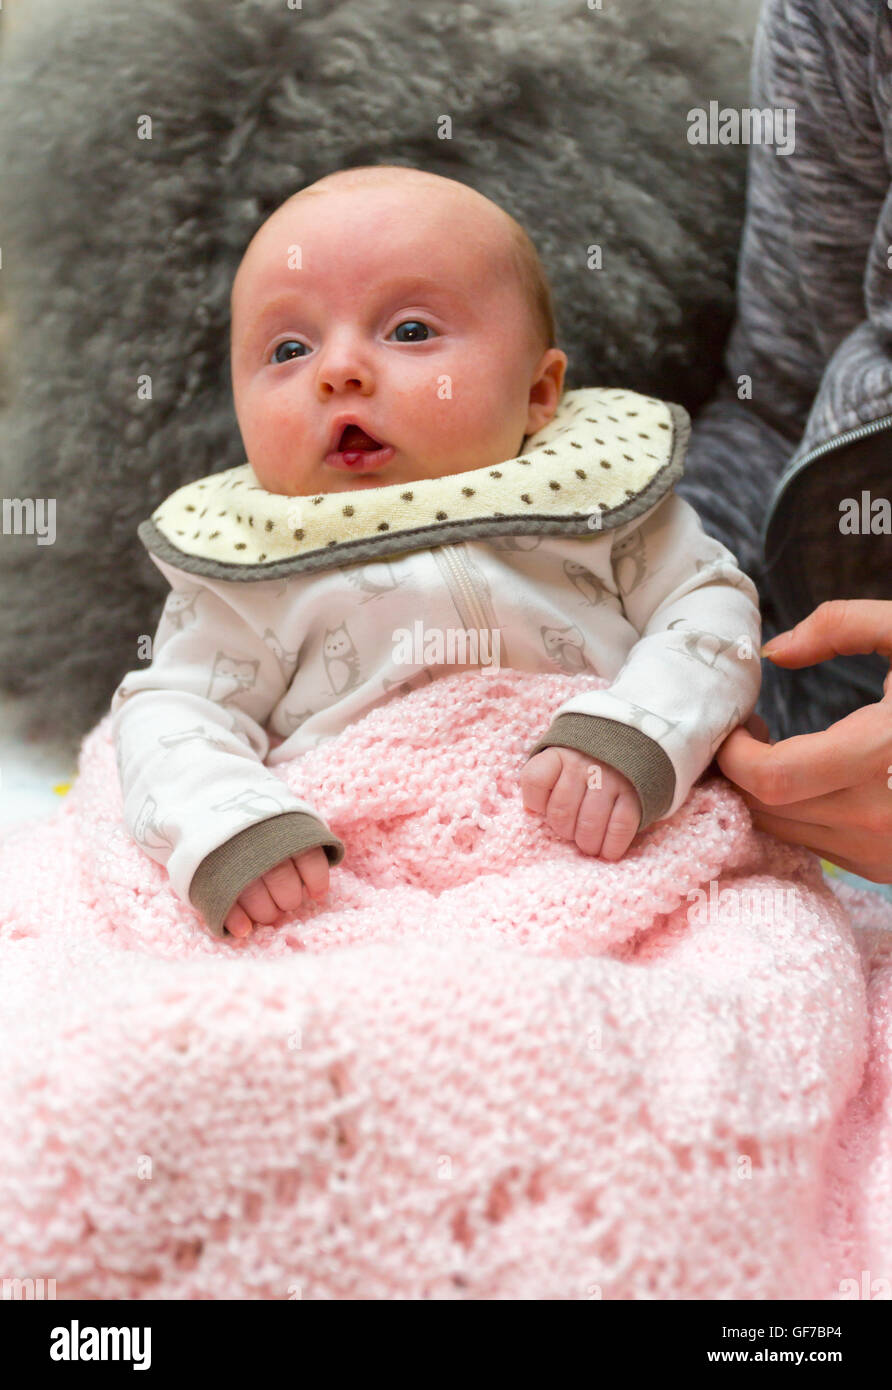 2 month old infant with hemangioma, benign tumor on her lip - Stock Image